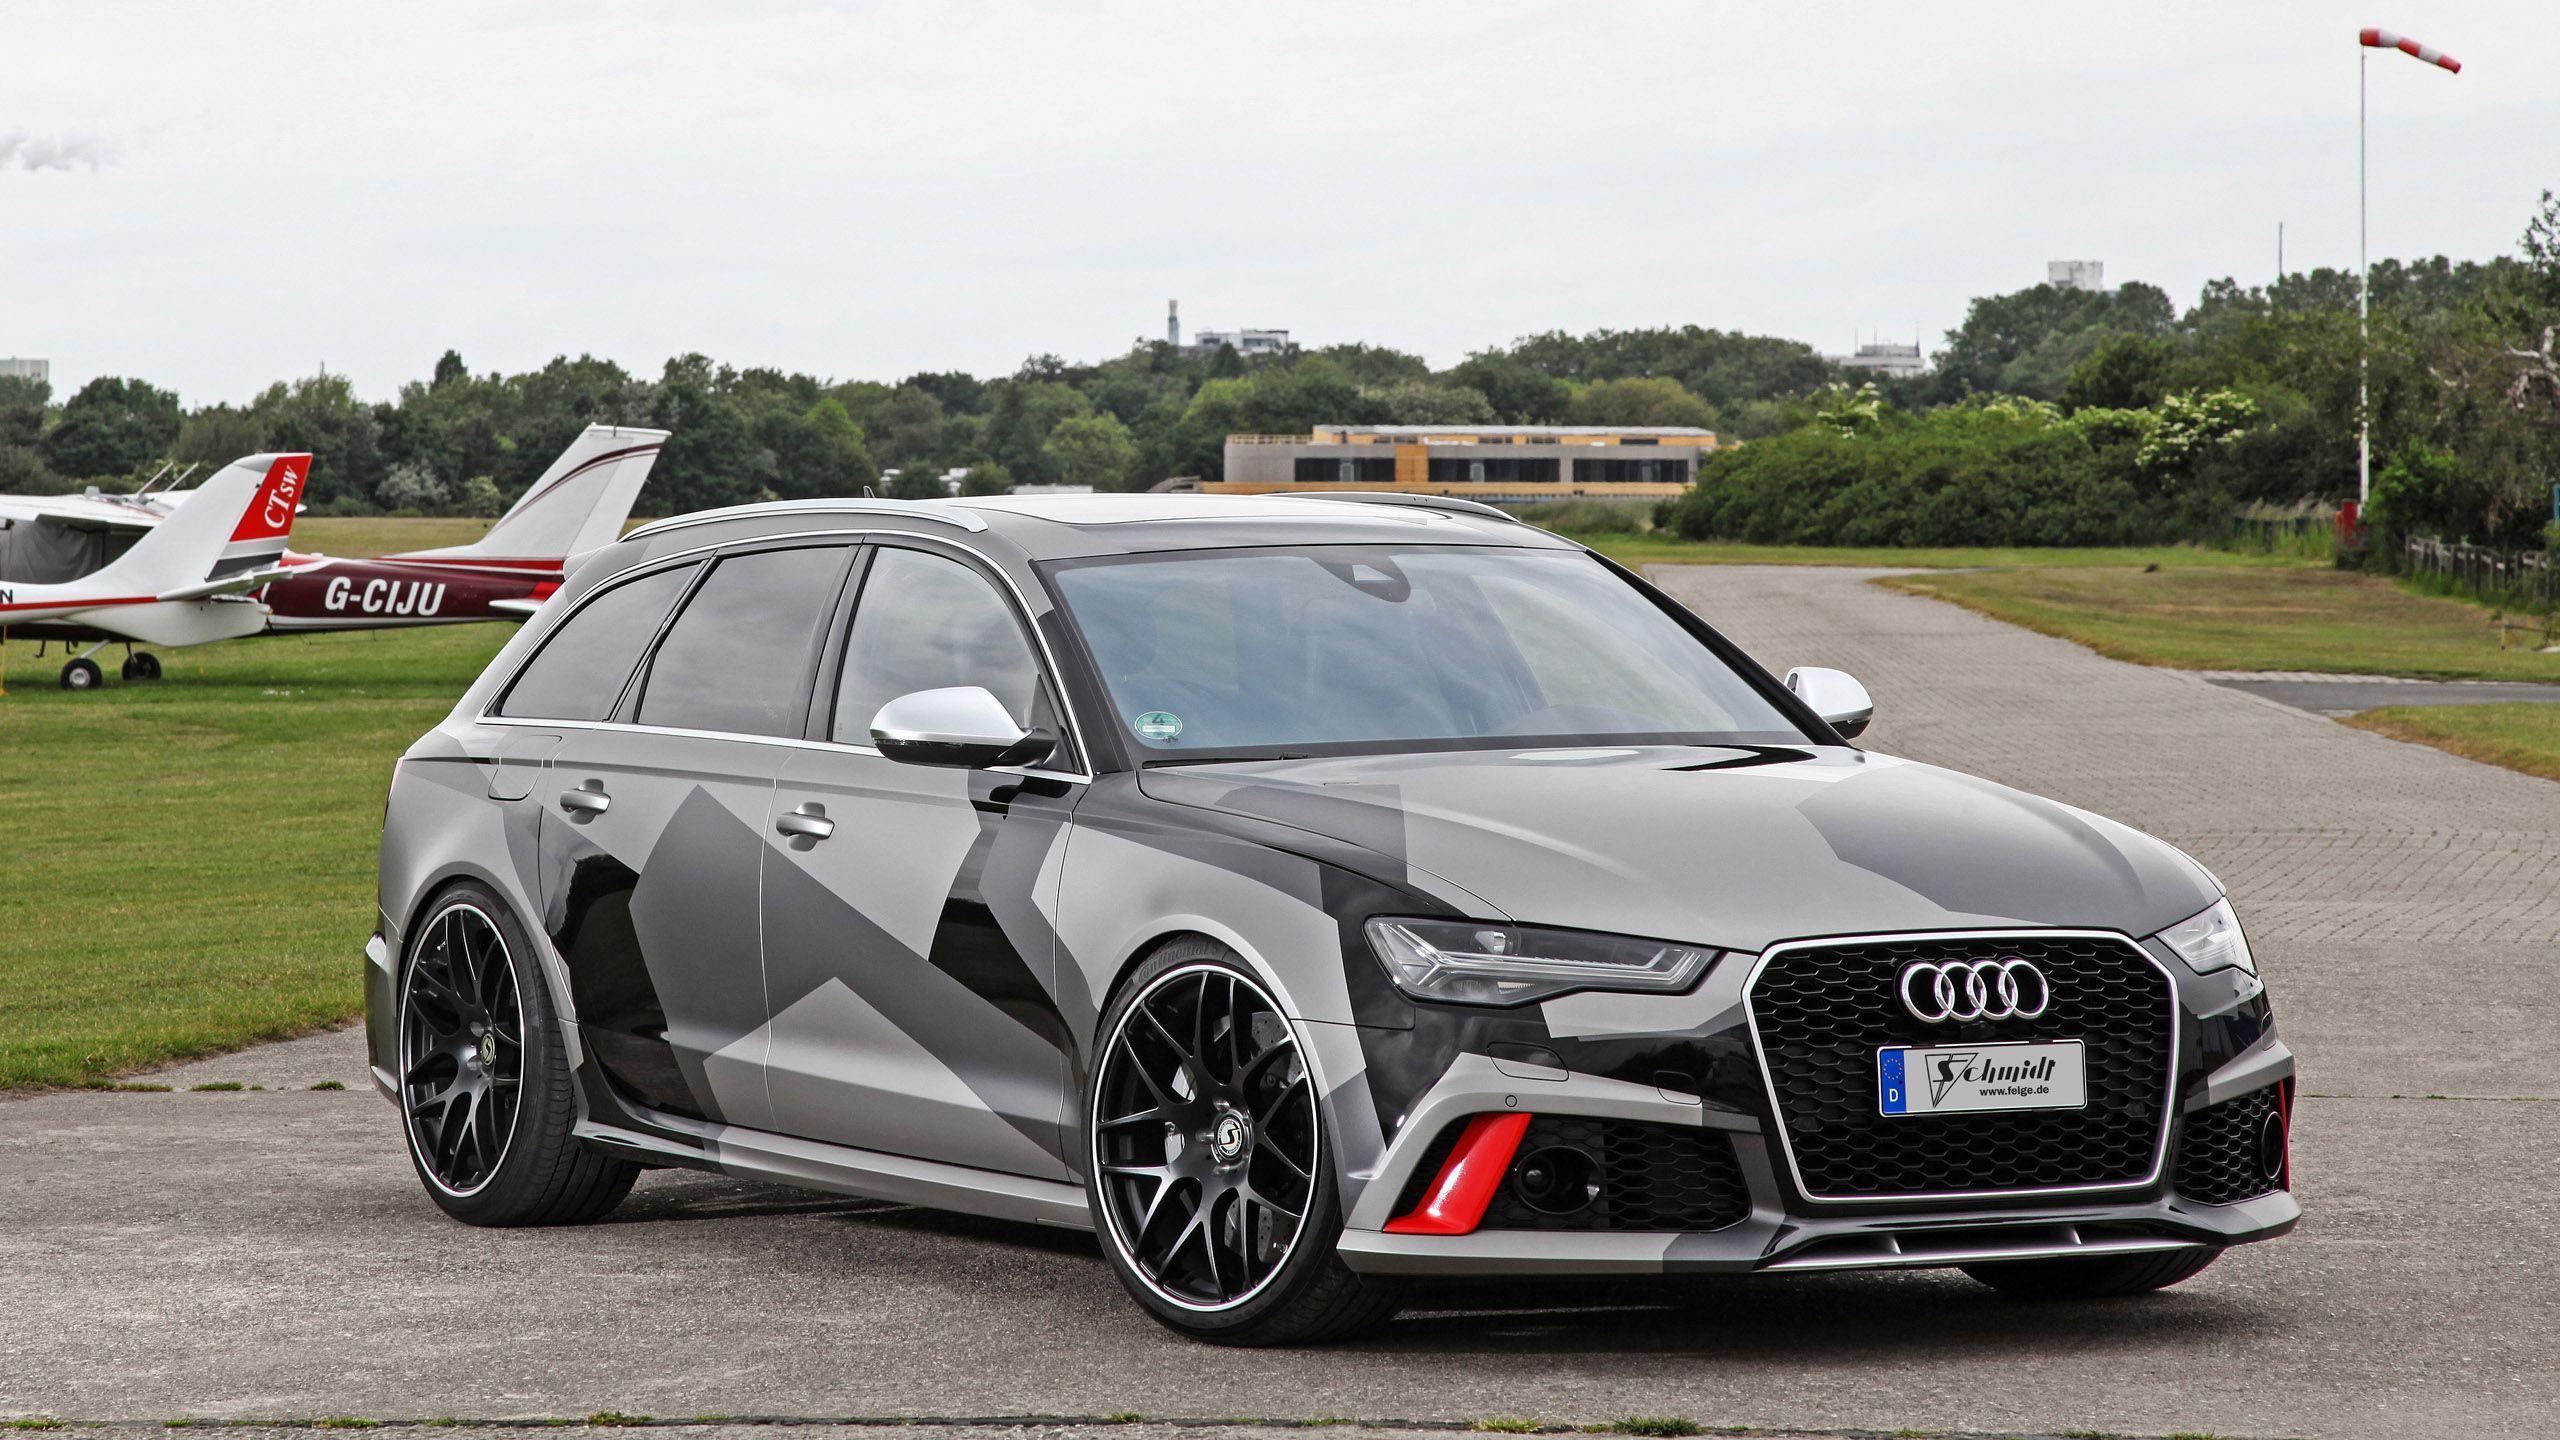 2015 Audi RS6 Avant Wallpaper | HD Car Wallpapers